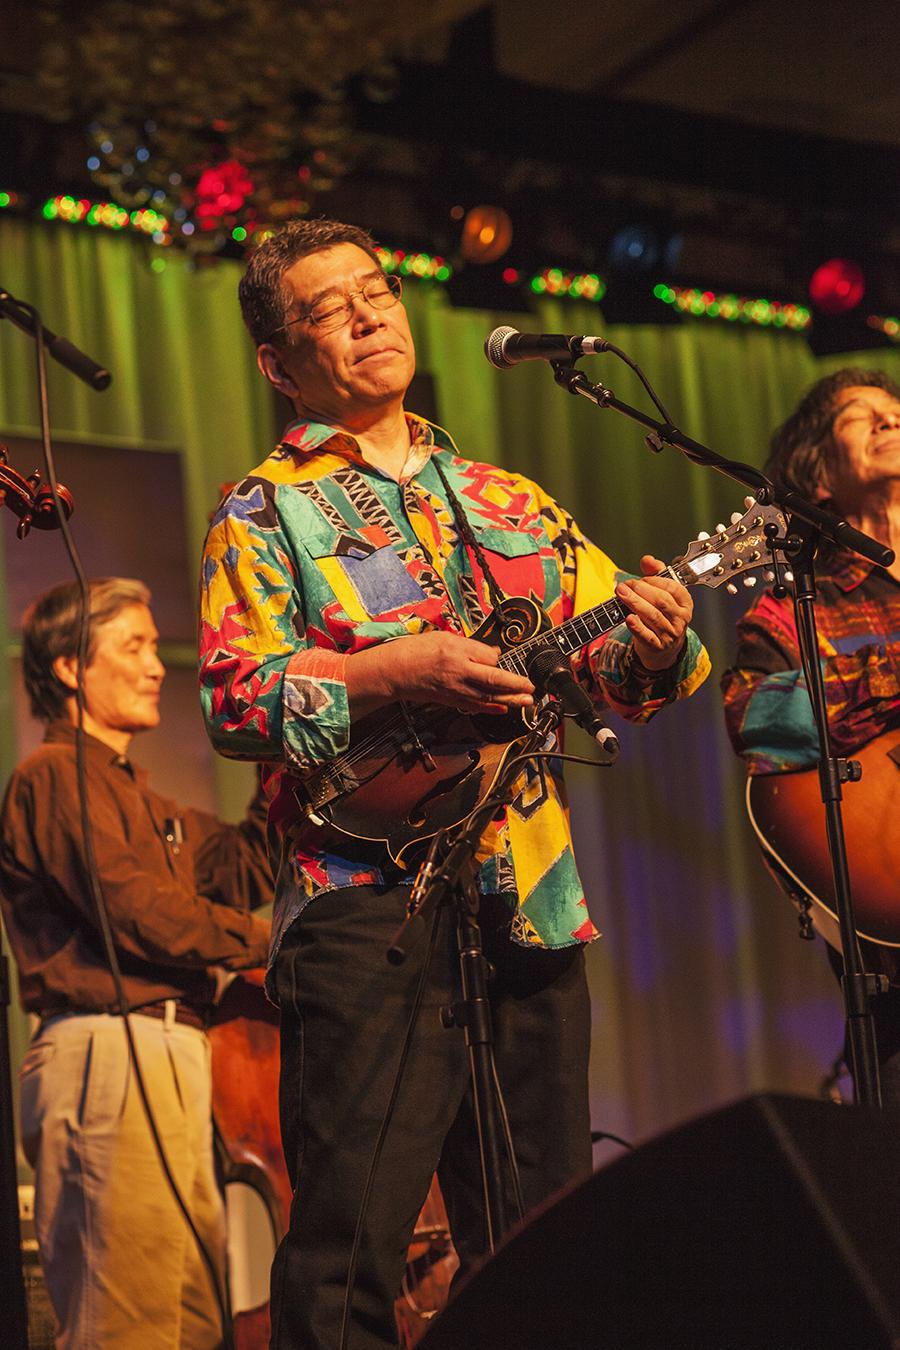 Akira Otsuka and Bluegrass 45. photo by Hermon joyner.